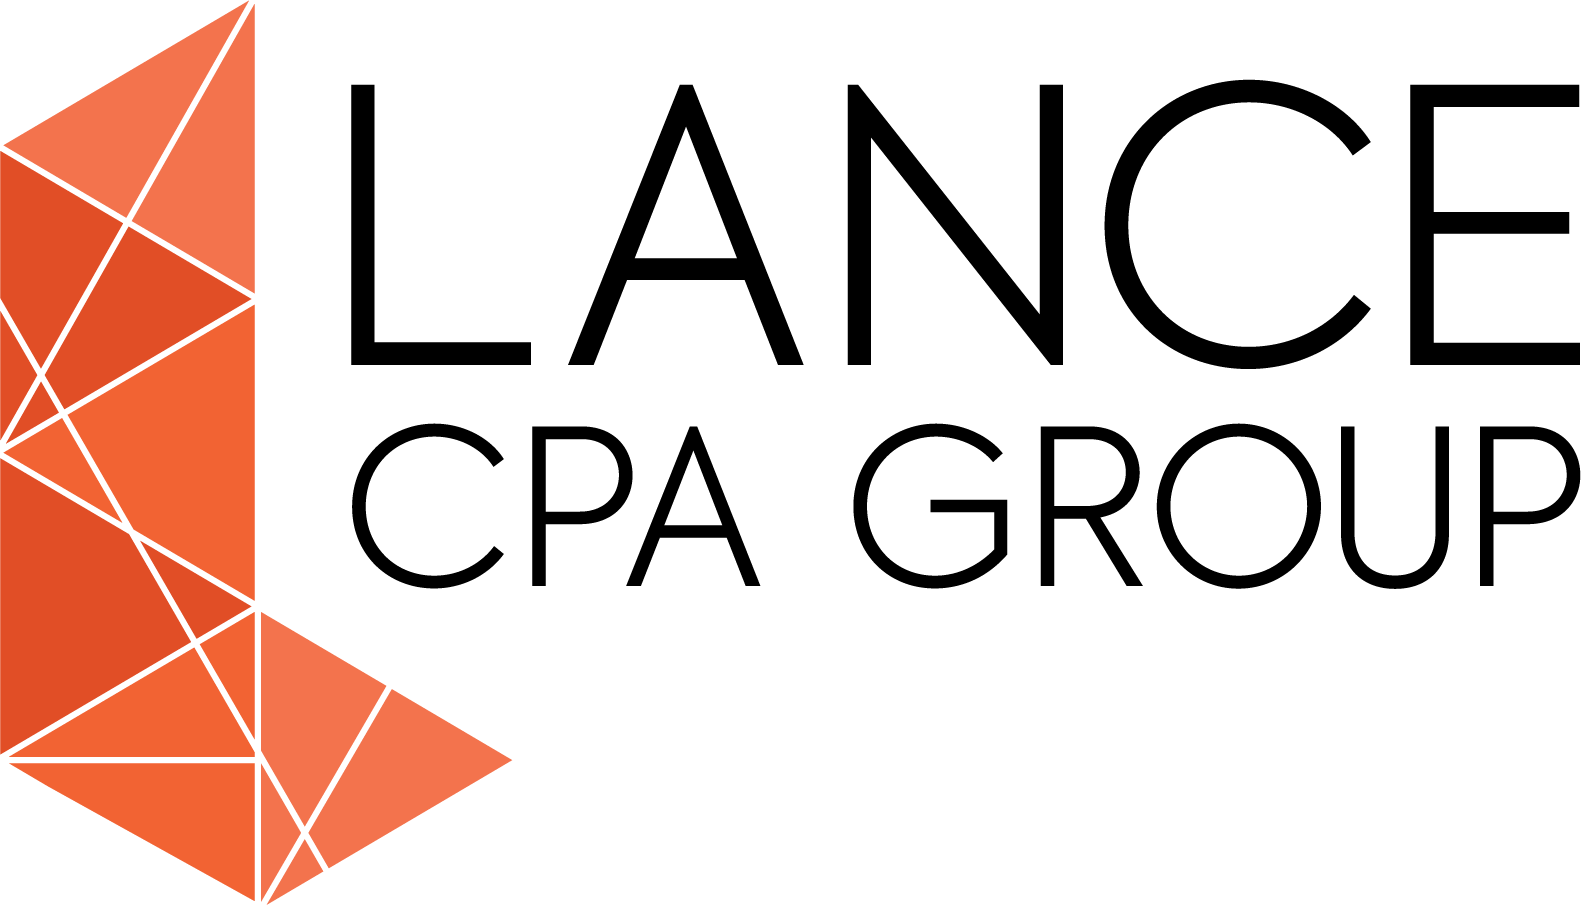 PerkUp customer Lance CPA Group's logo